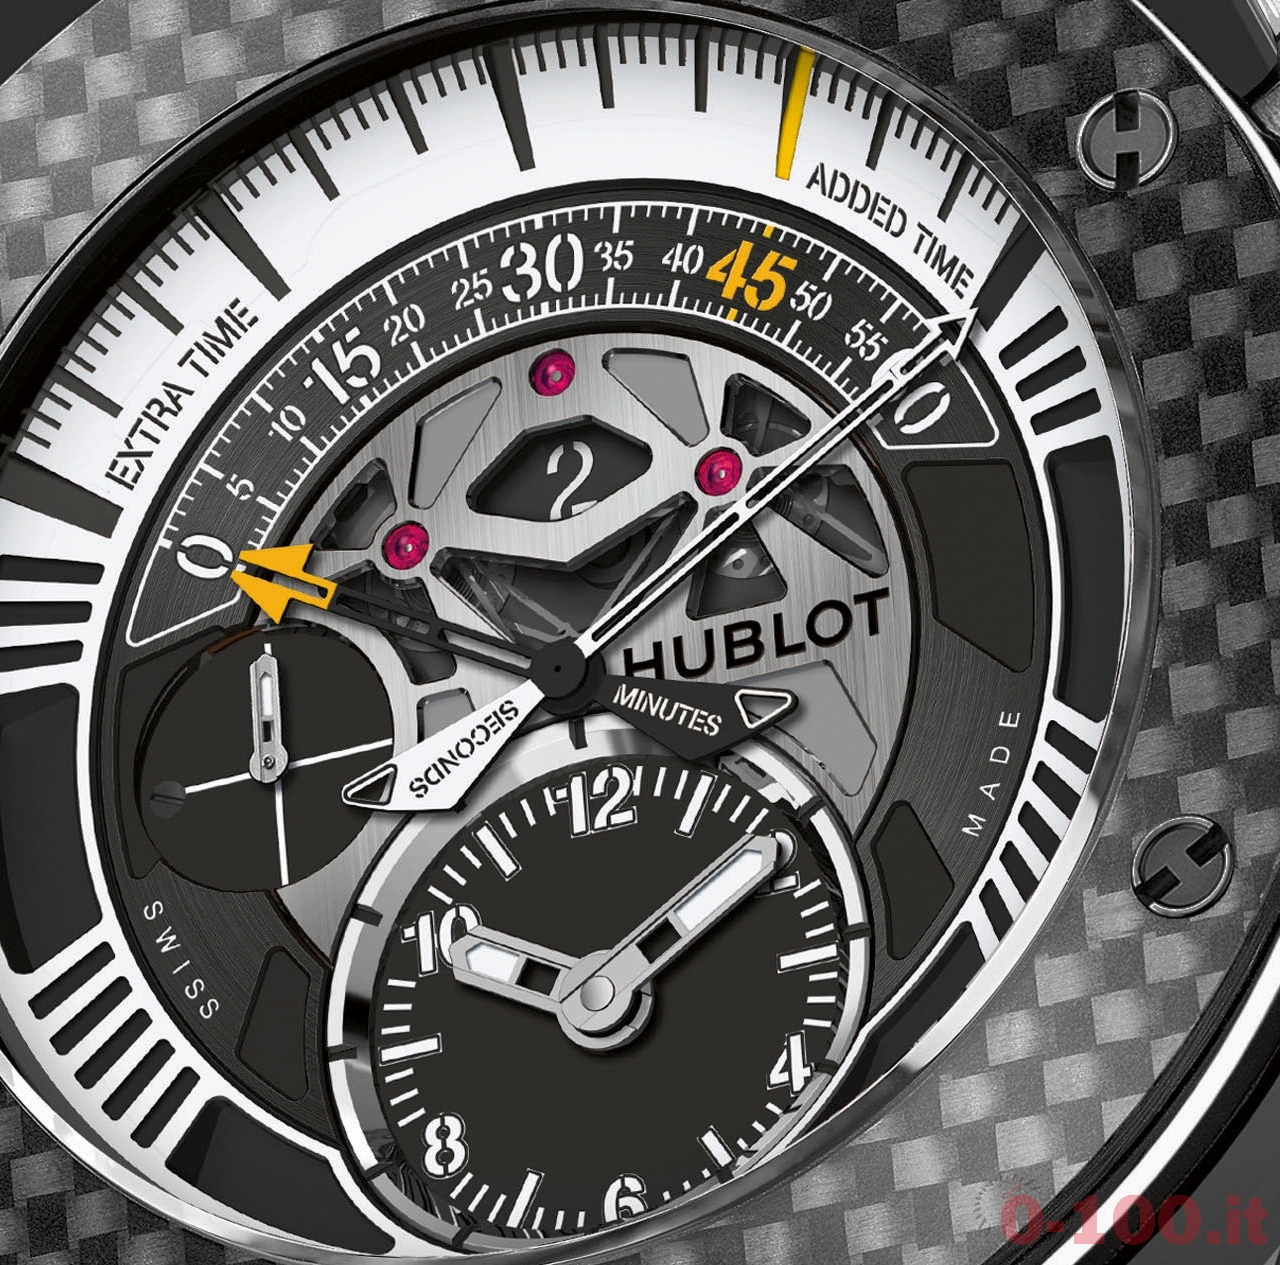 hublot-big-bang-unico-bi-retrograde-juventus-prezzo-price_0-1002